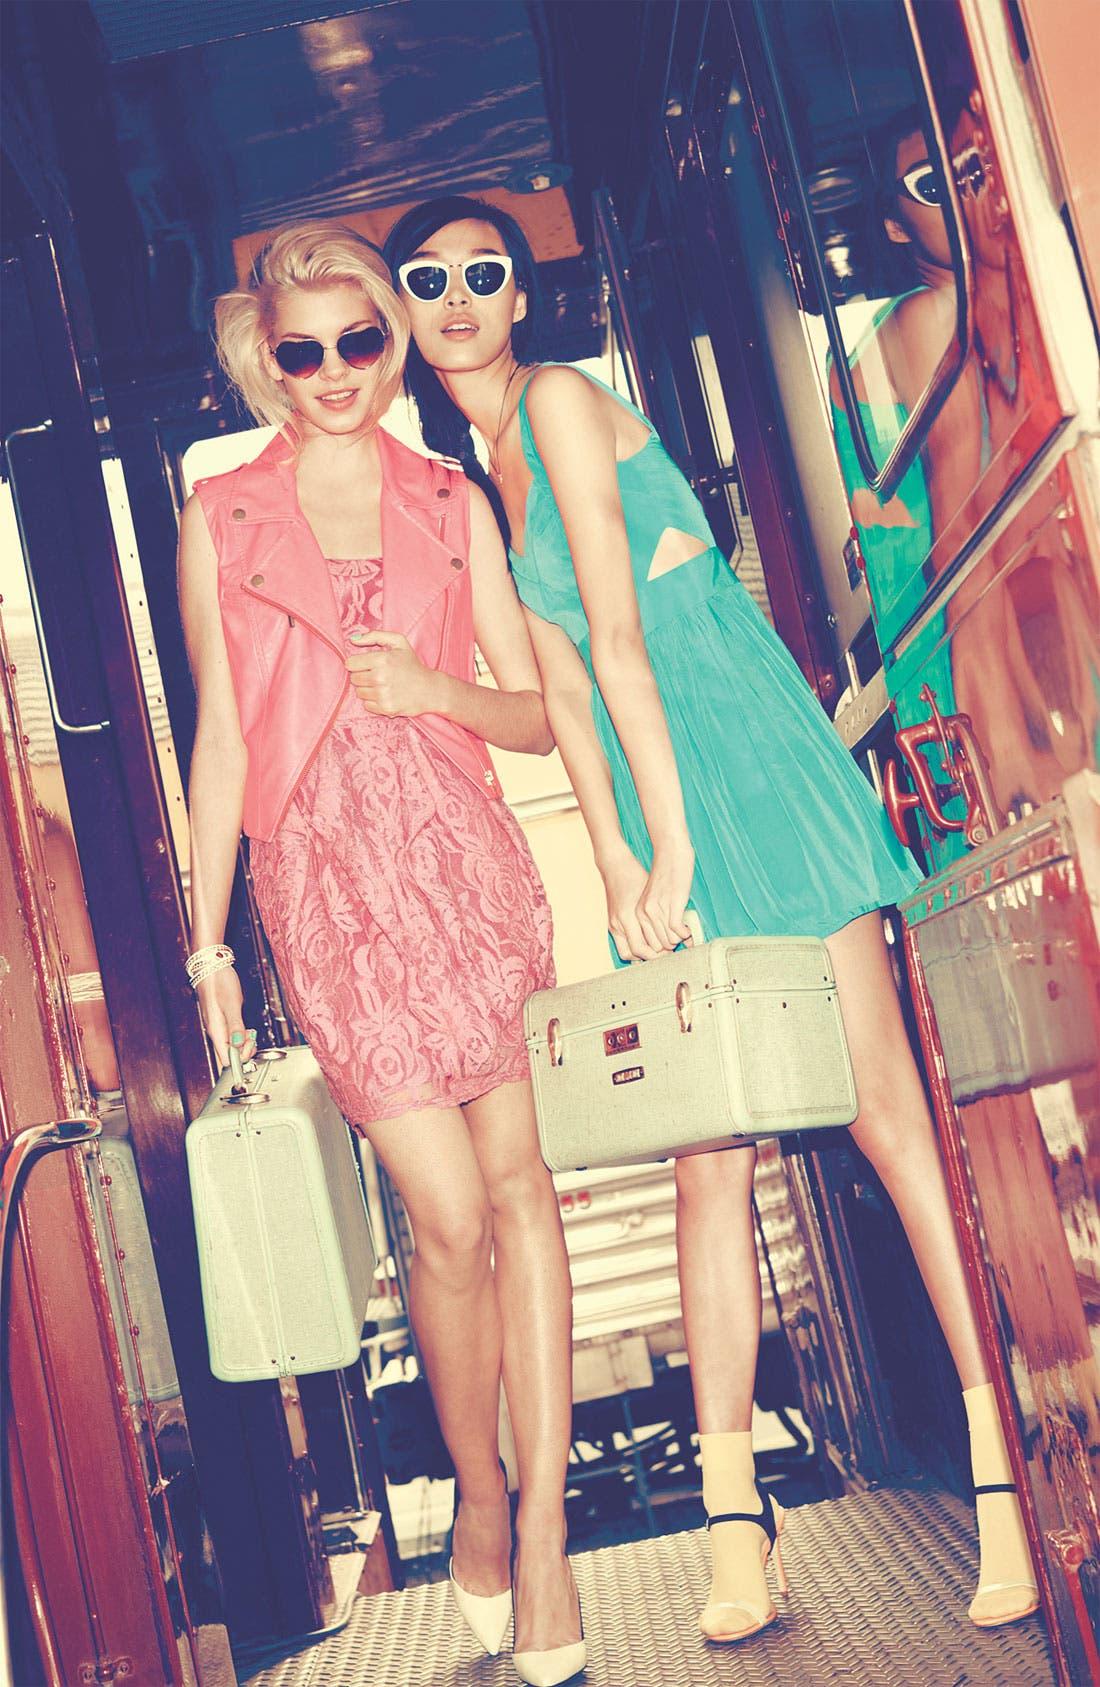 Alternate Image 1 Selected - Keepsake the Label Dress & Accessories